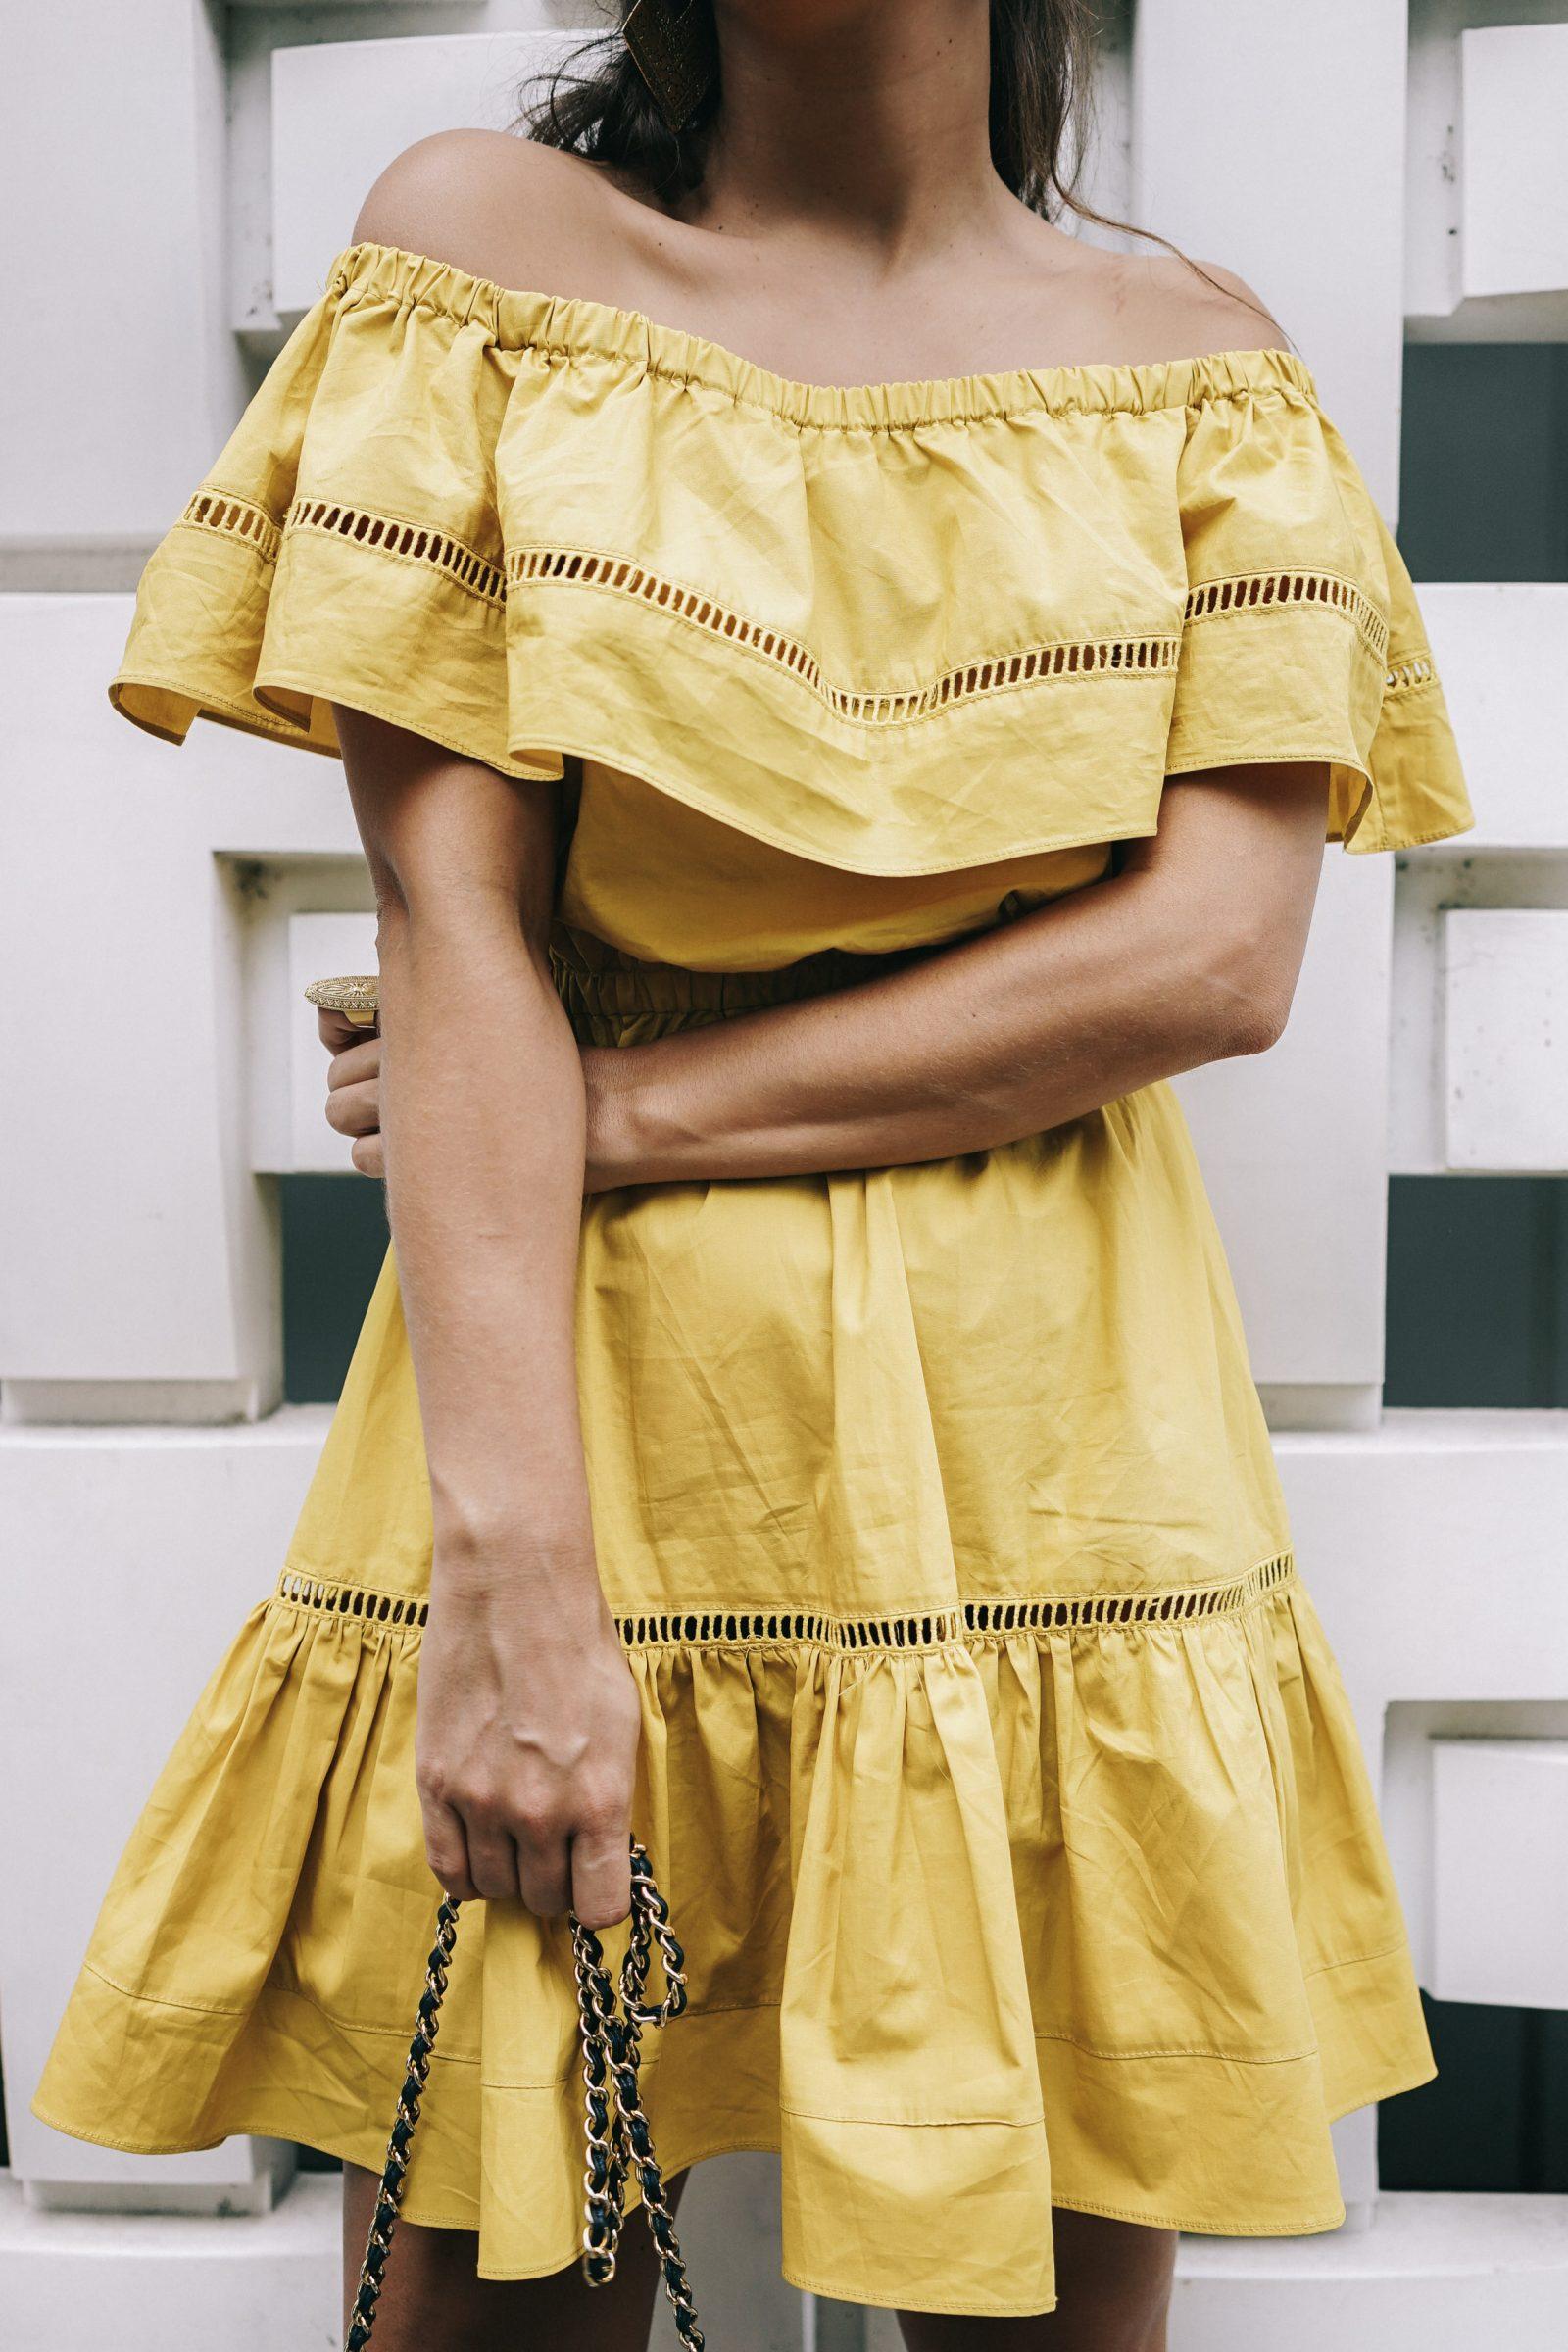 tokyo_travel_guide-outfit-collage_vintage-street_style-off_the_shoulders_dress-mustard_dress-soludos_sandals-chanel_vintage-bag-vintage_stores-54